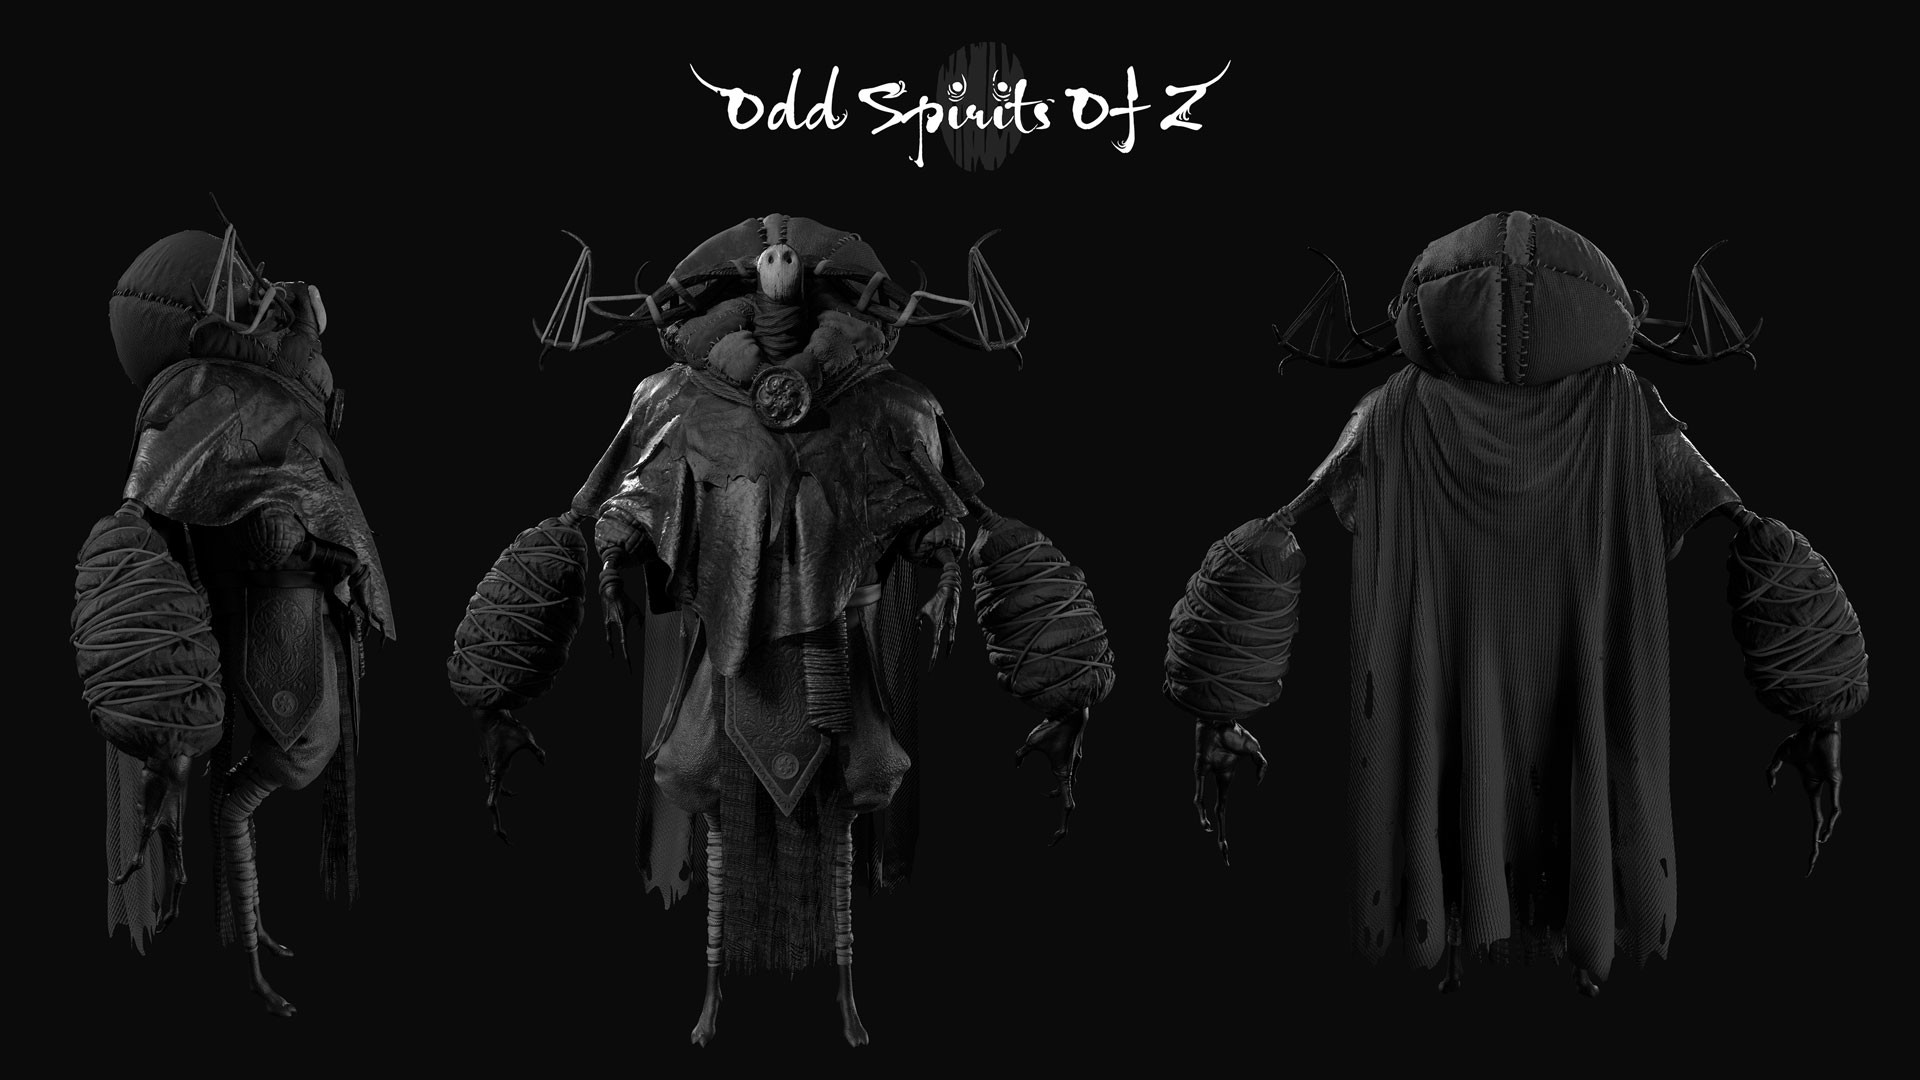 Odd Spirit Character views